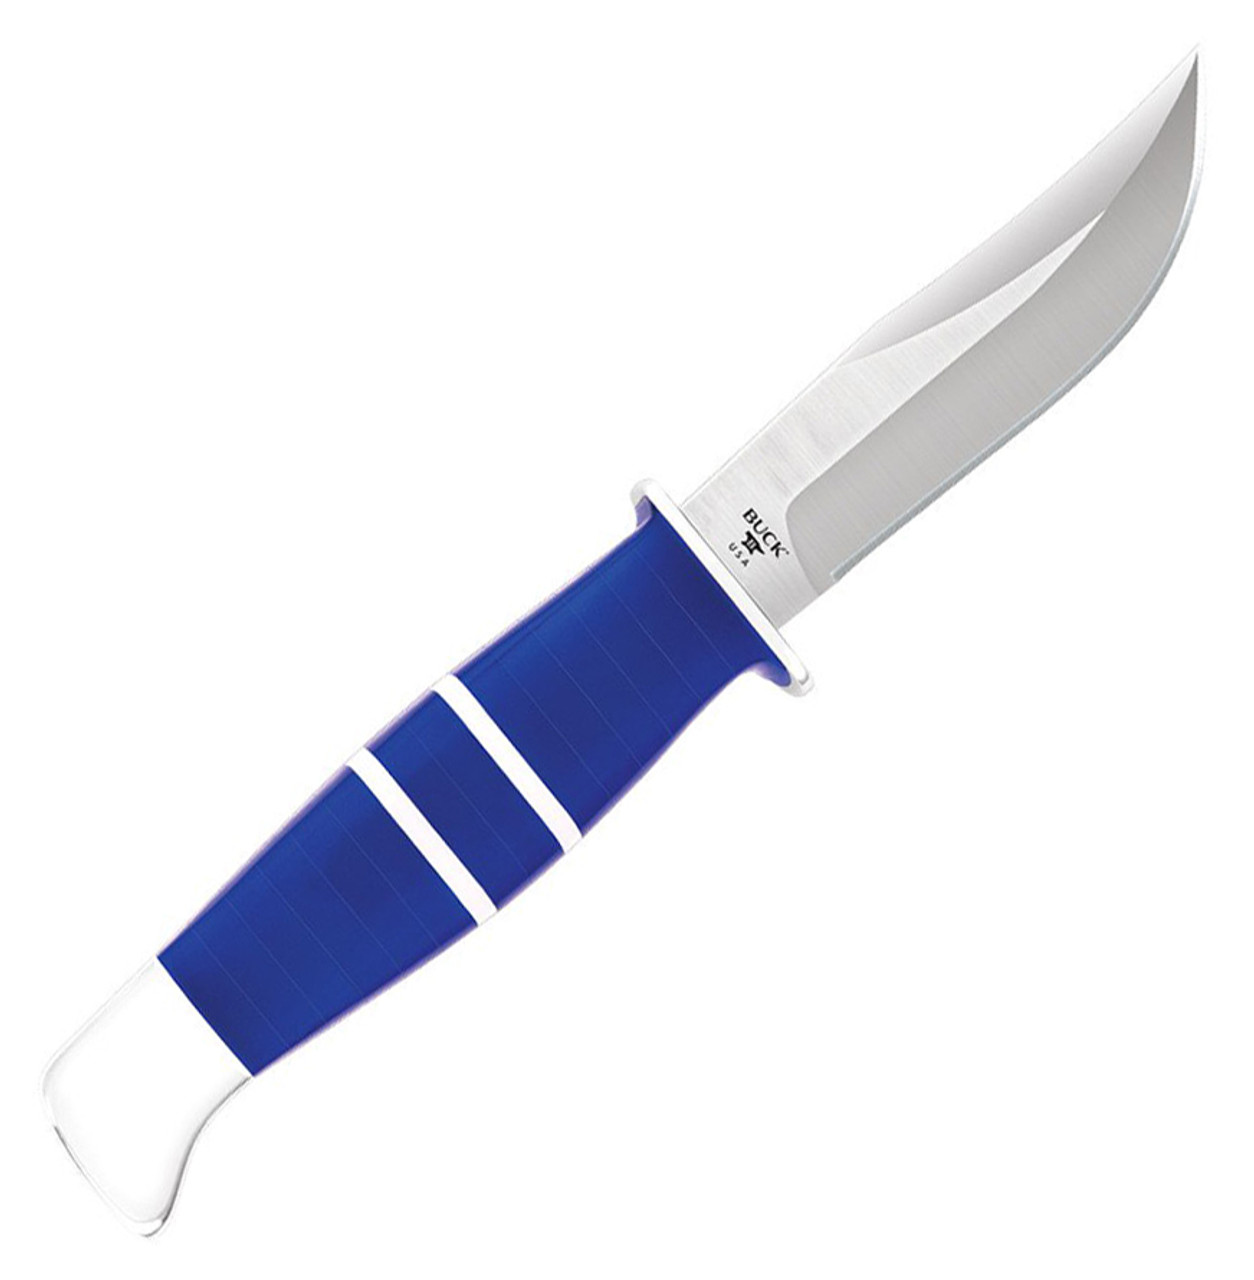 "Buck 212 Fixed Ranger 0212BLSLE- 2021 Legacy Collection,  3.63""W2 Steel Satin Plain Blade,  Blue & White Lucite"